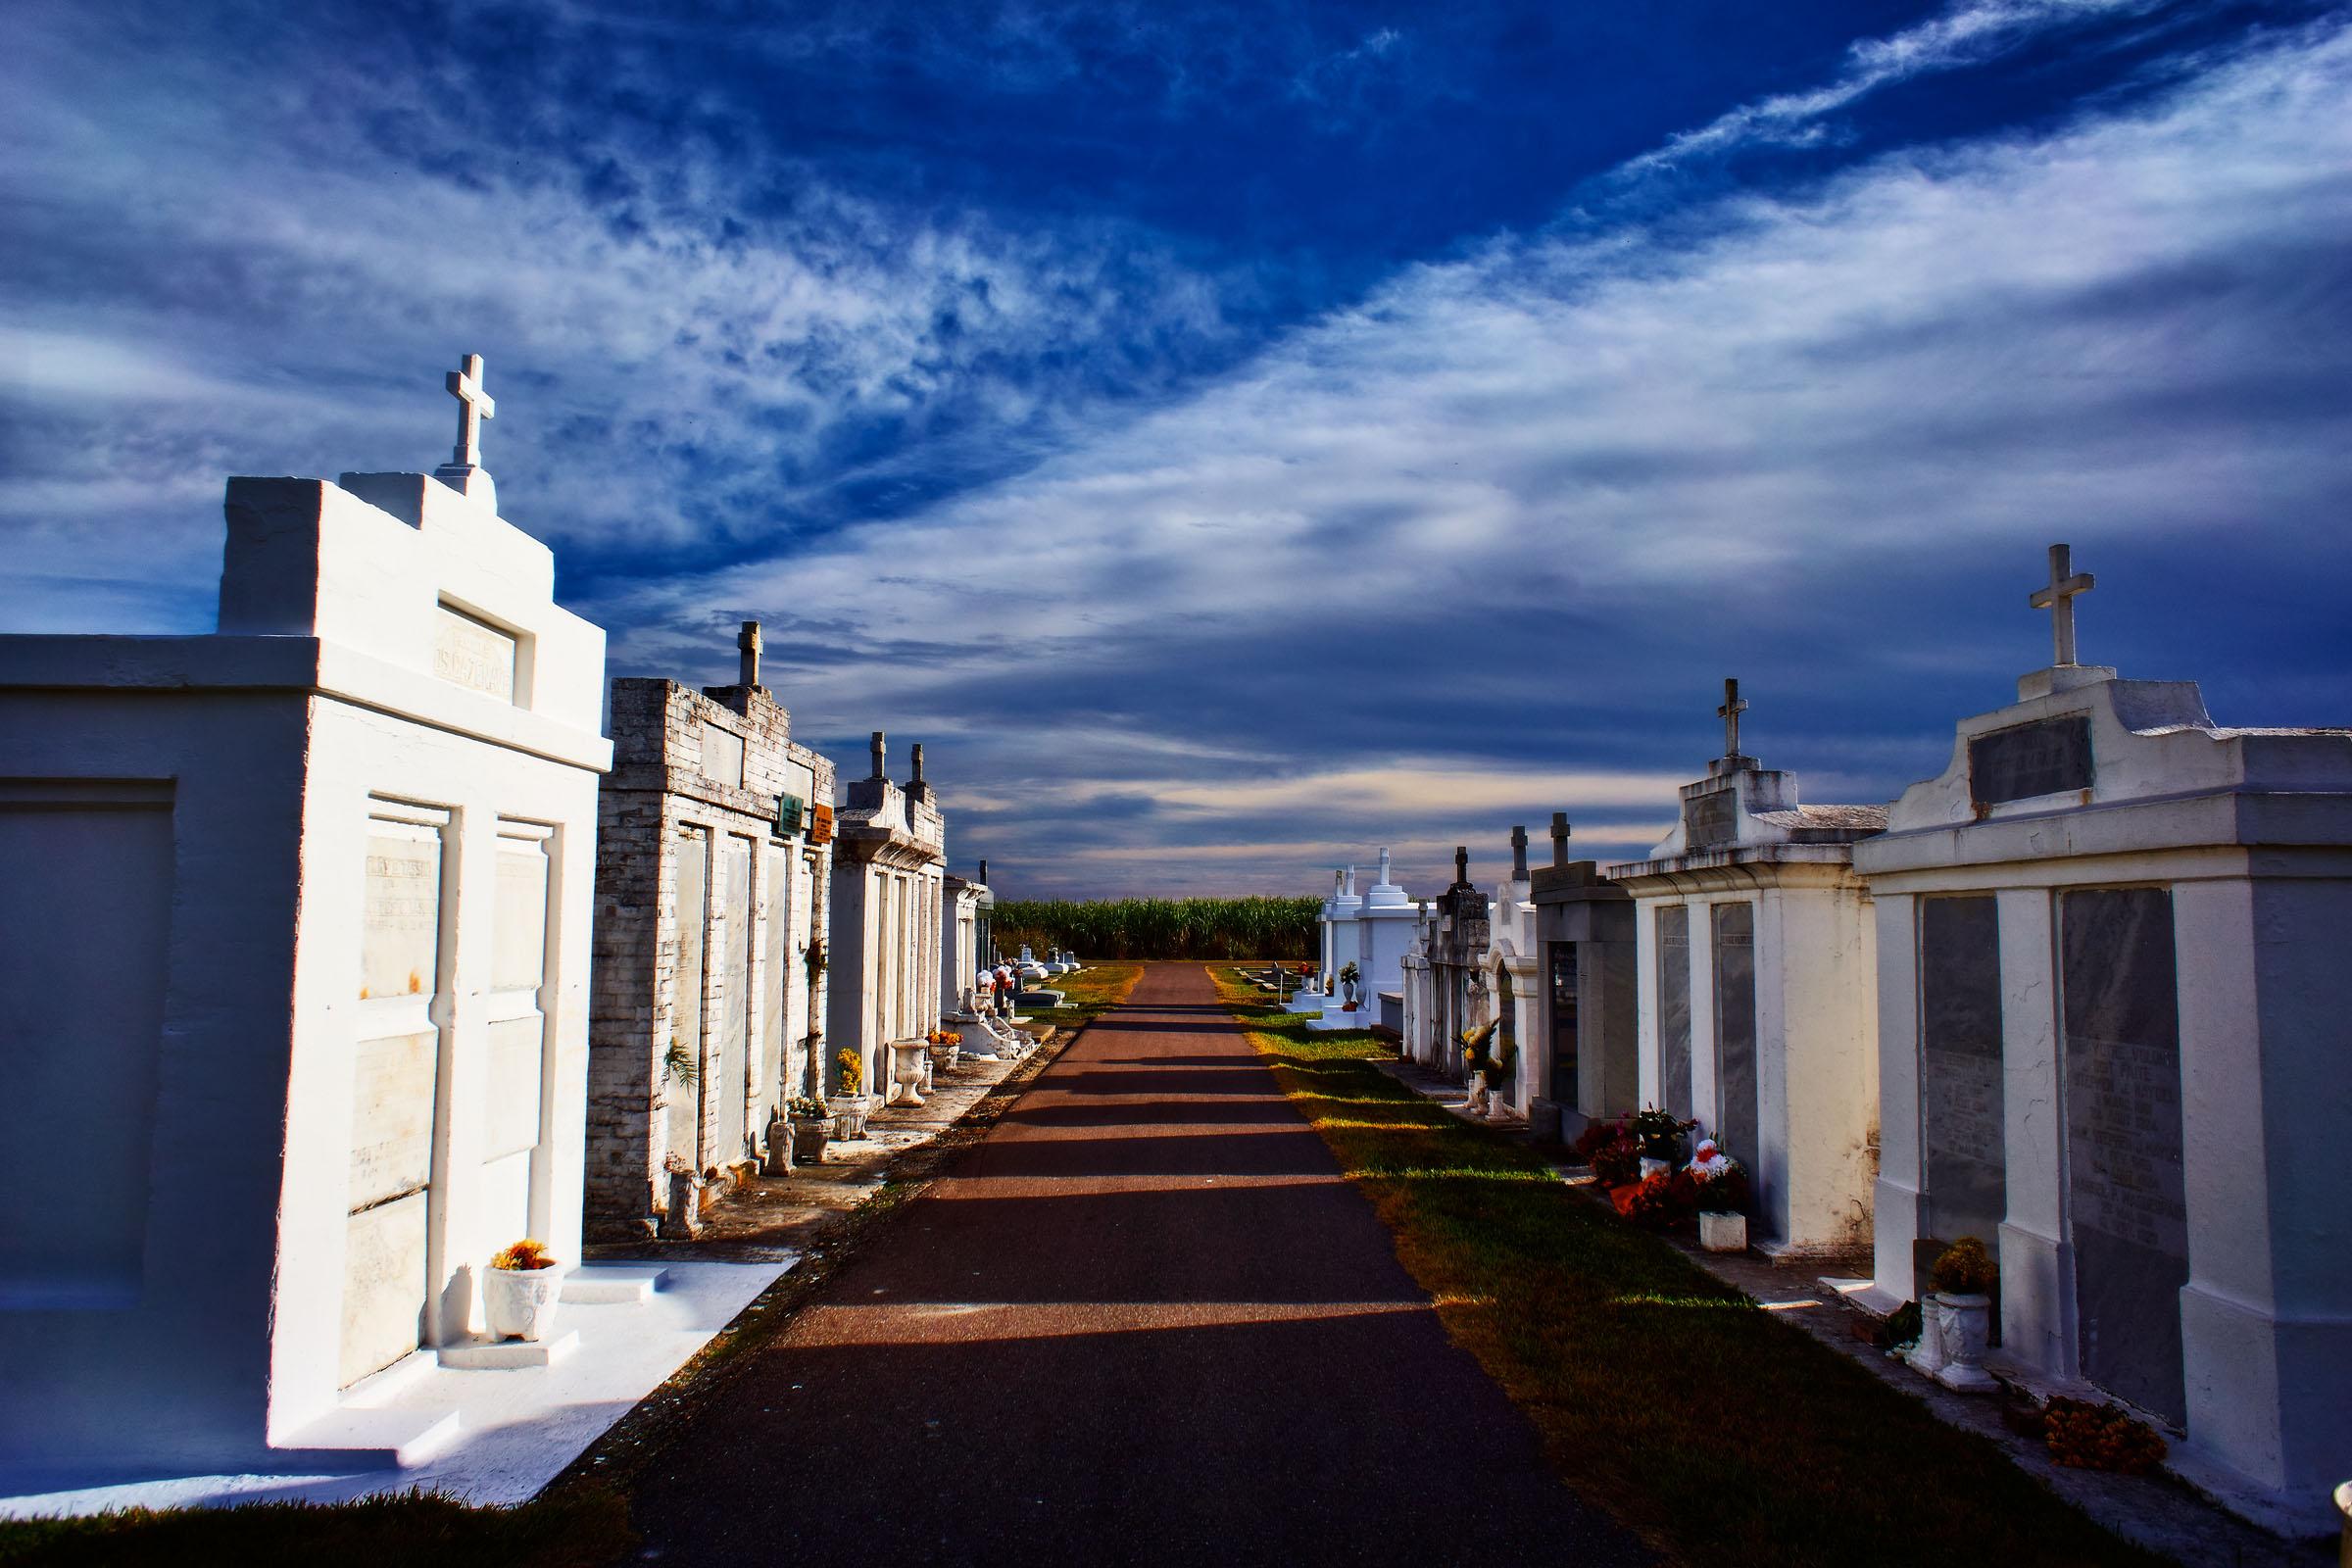 Sugar cane fields surround the cemetery.